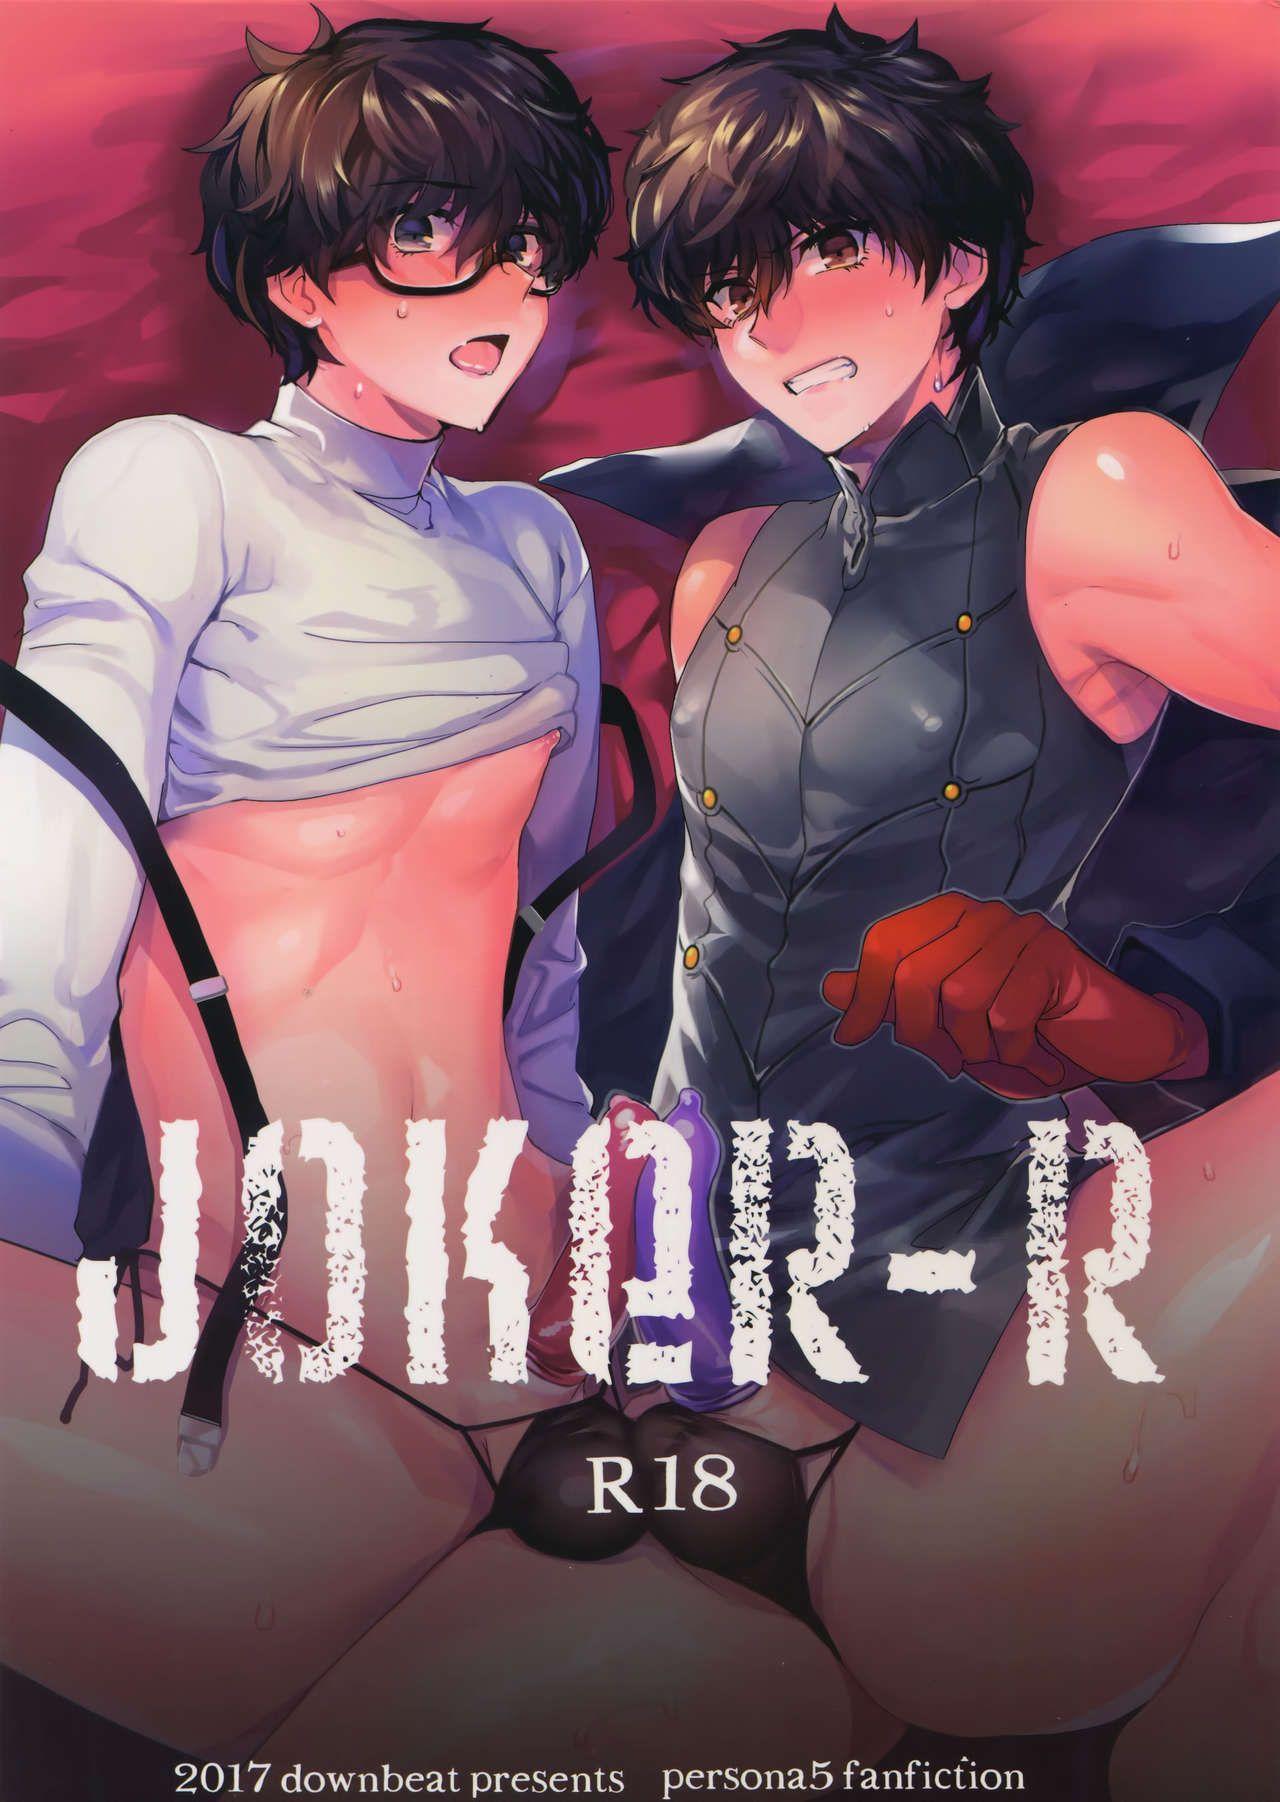 JOKER-R (アナザーコントロール7) [downbeat (桐下悠司)] (ペルソナ5) [英訳] 0